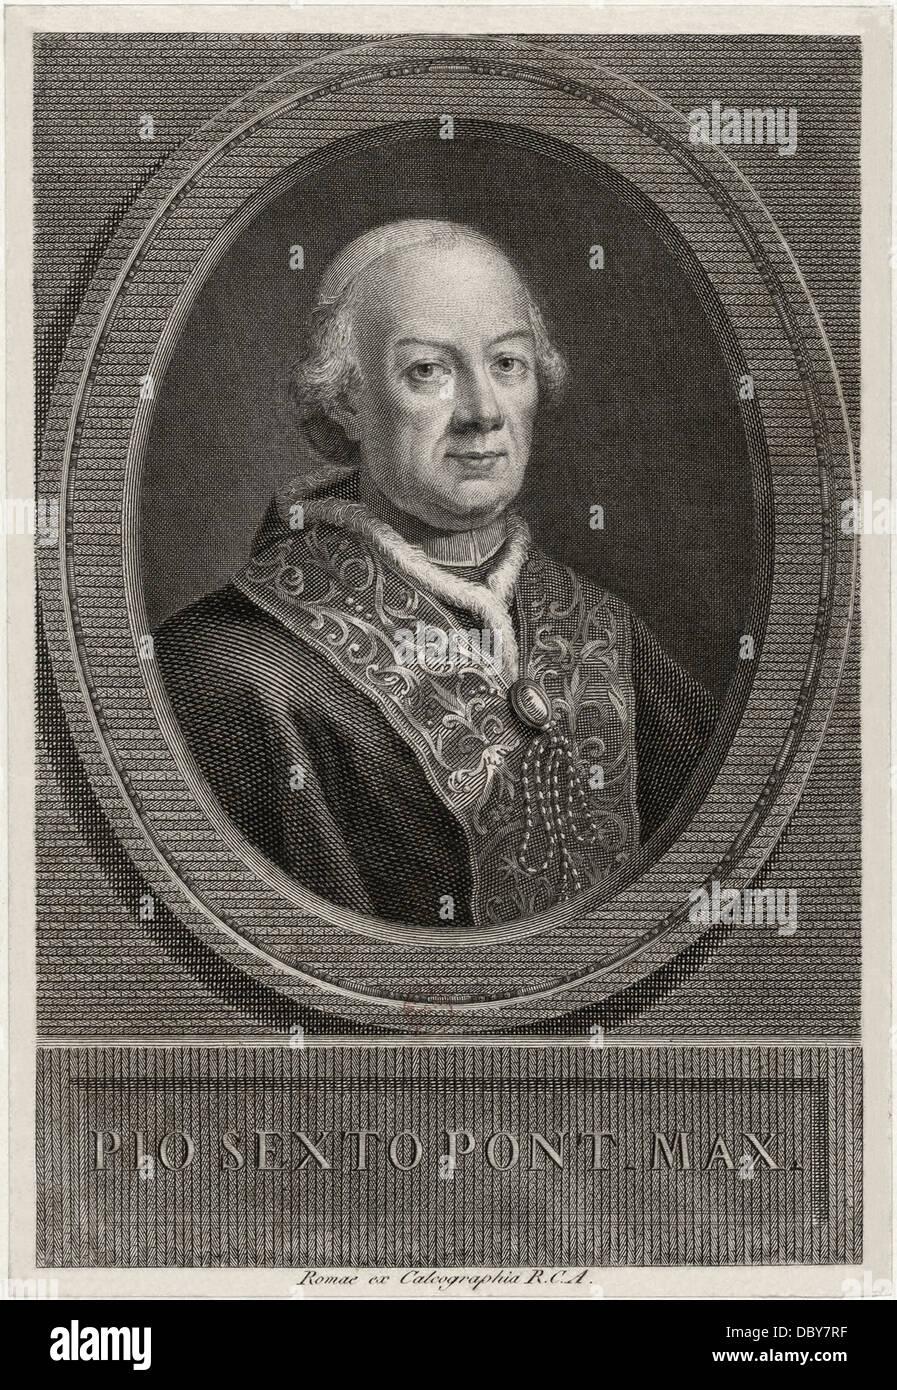 Pius VI (1717 - 1799), 250th pope of the Roman Catholic Church. - Stock Image